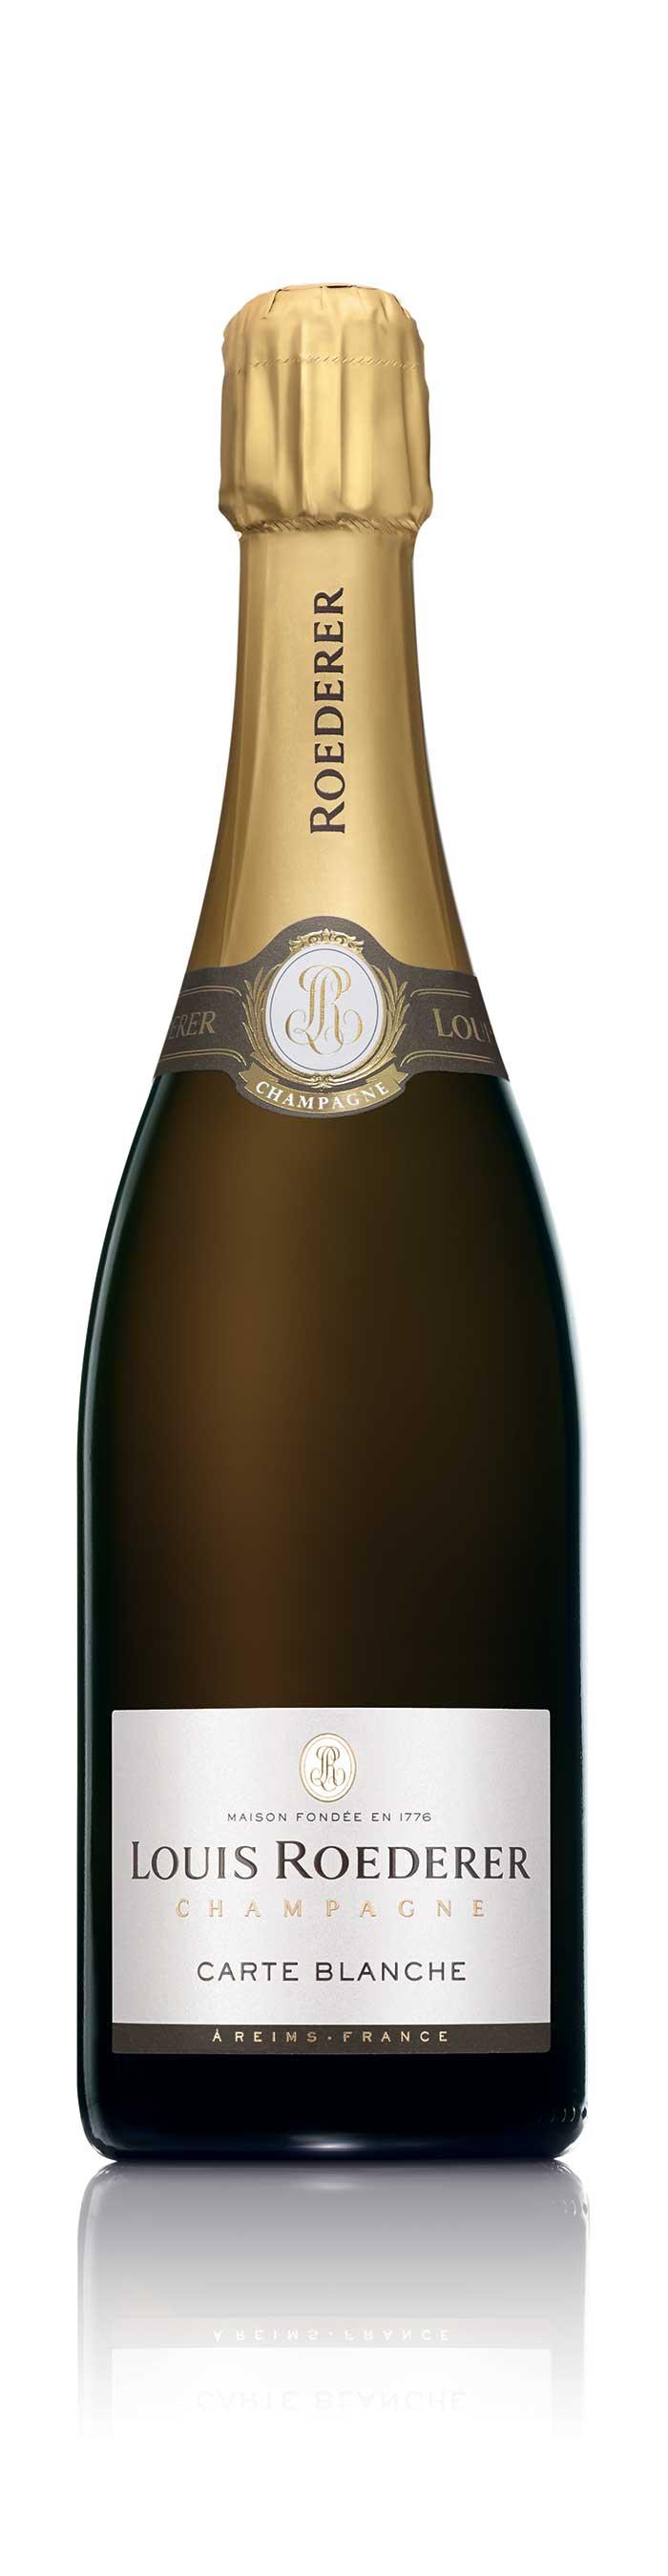 Carte Blanche Demi-Sec, Champagne Louis Roederer